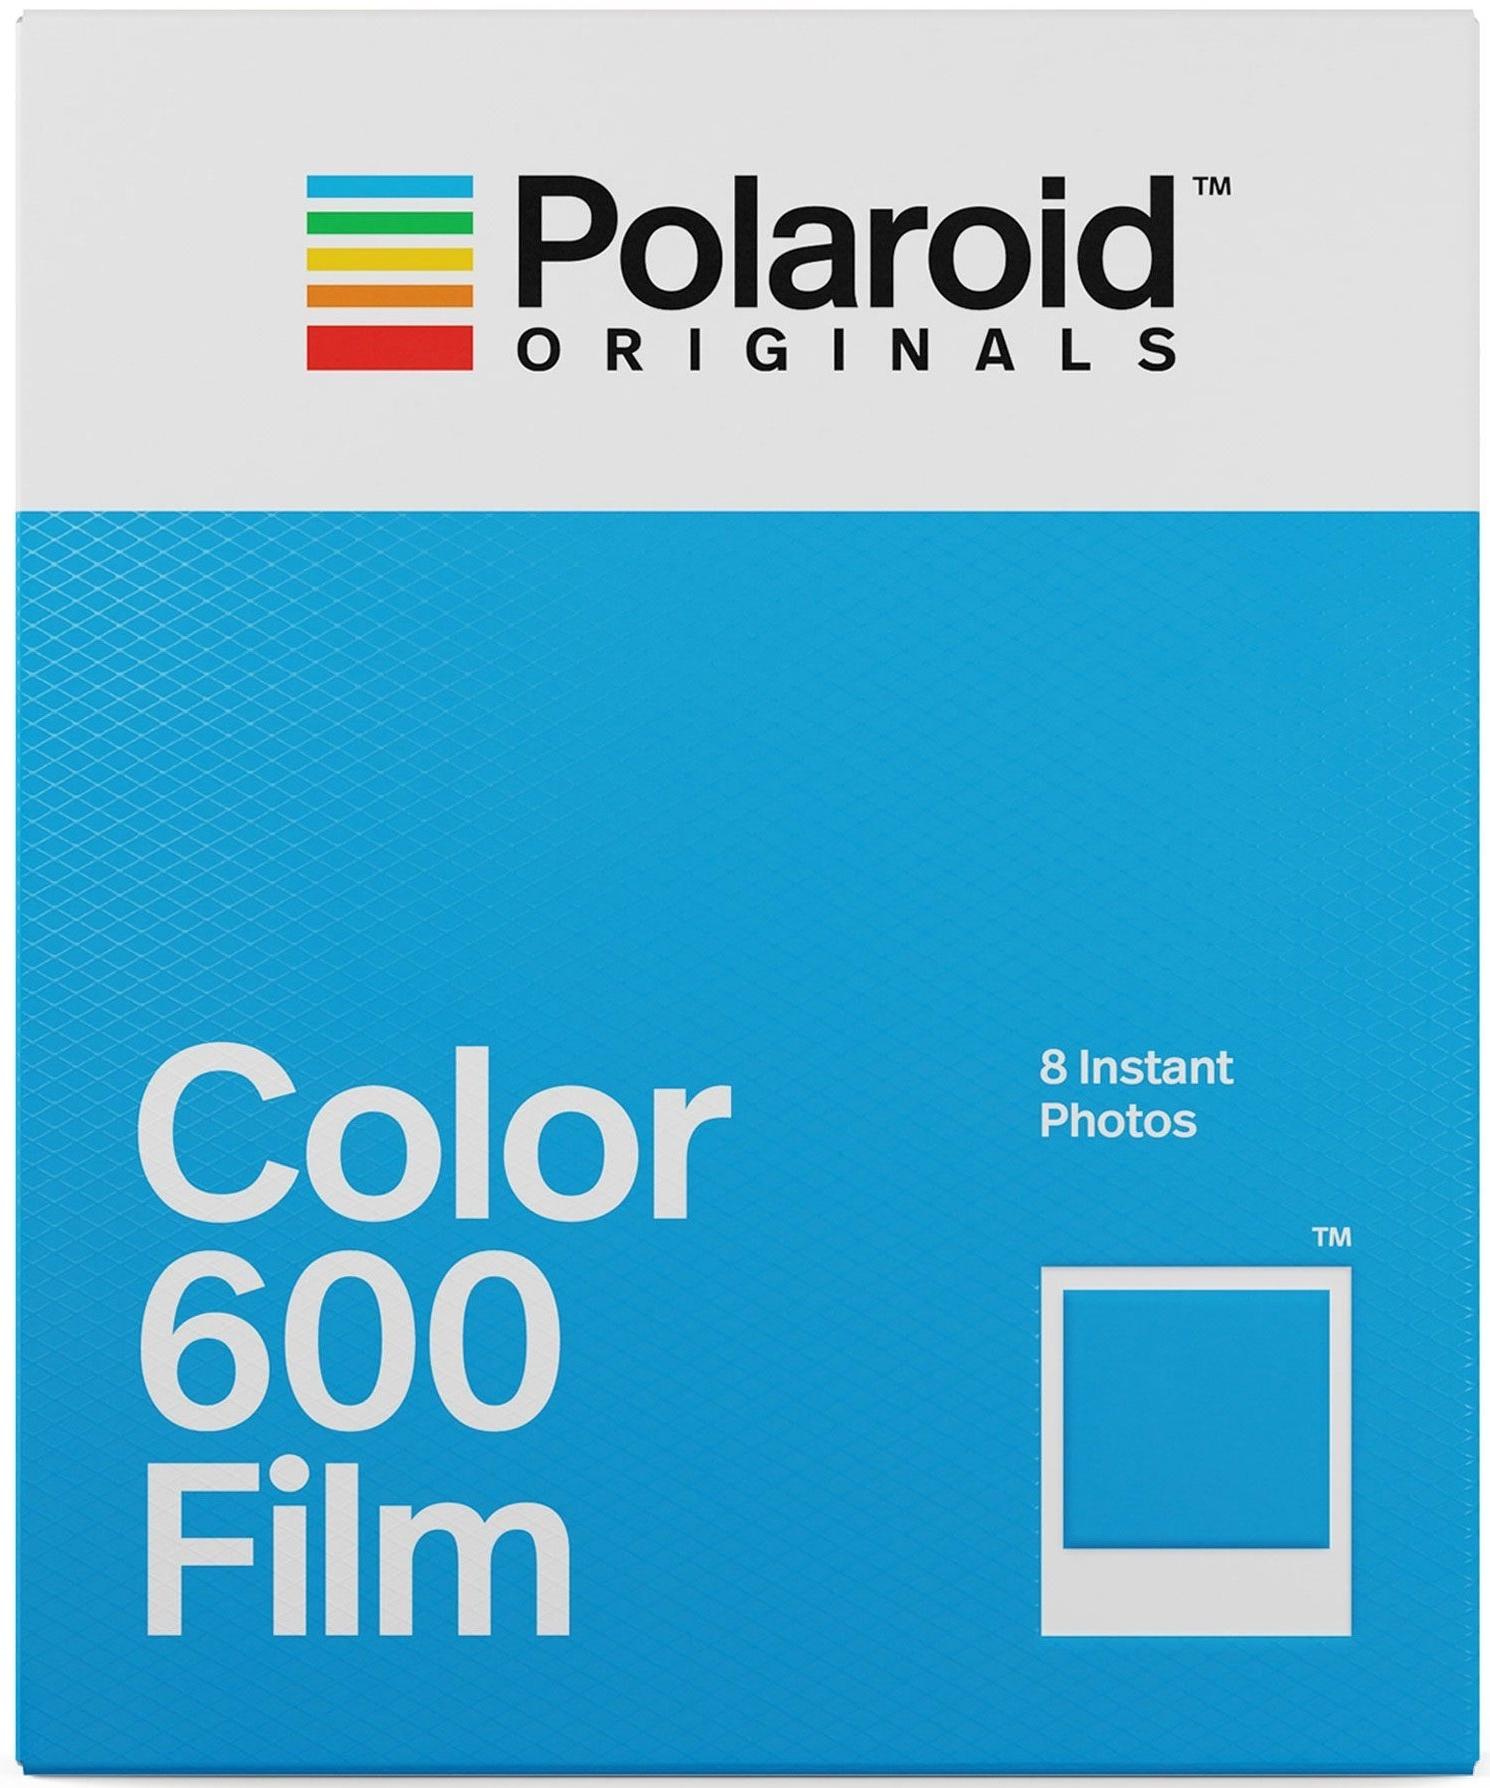 POLAROID ORIGINALS barevný film pro Polaroid 600/8 snímků